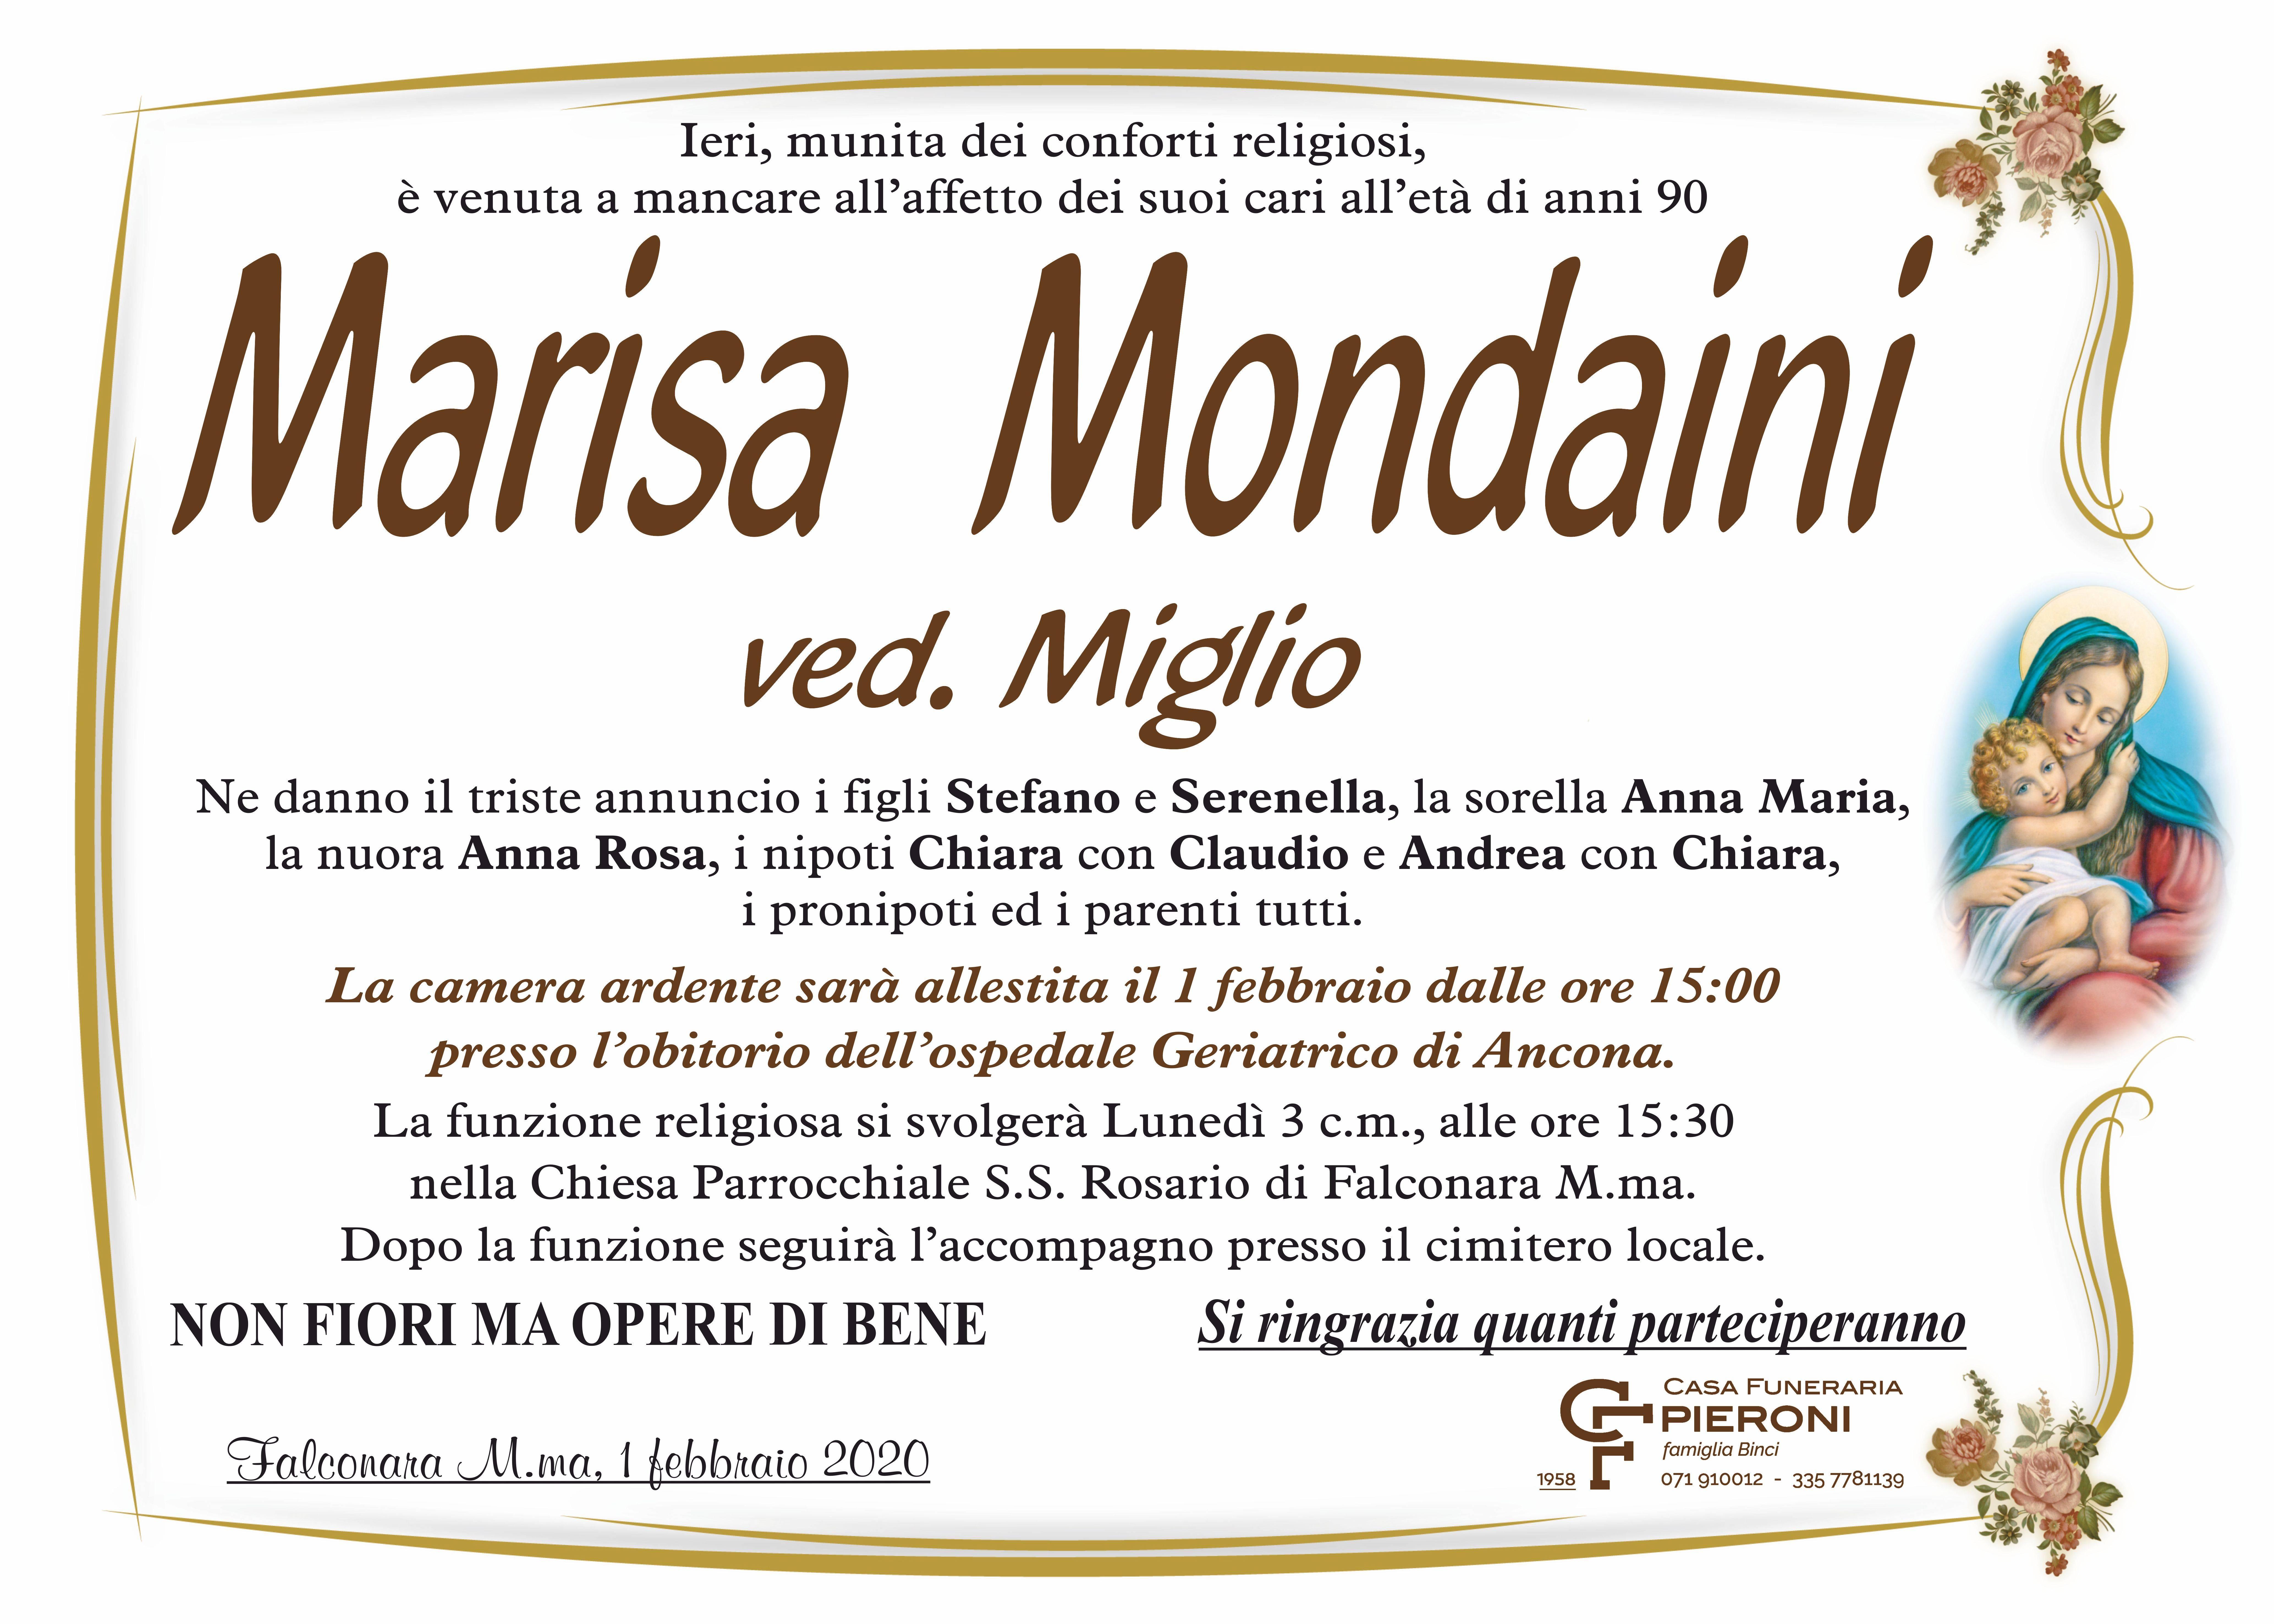 Marisa Mondaini